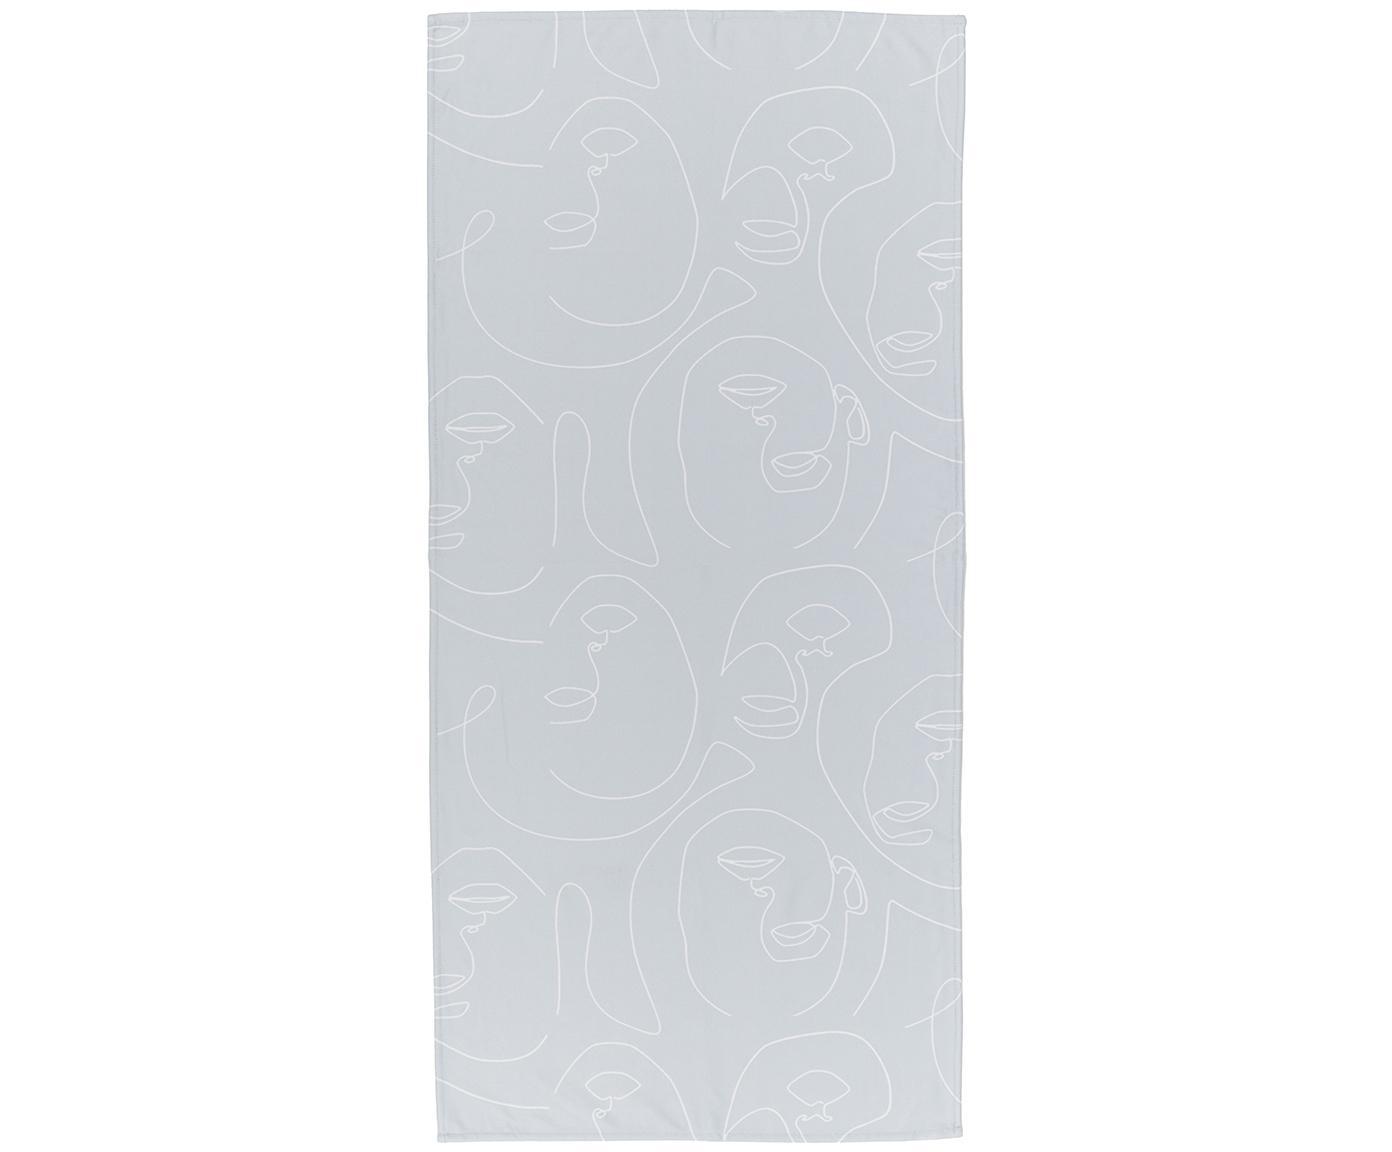 Licht strandlaken Faces, 55% polyester, 45% katoen zeer lichte kwaliteit, 340 g/m², Grijs, wit, 70 x 150 cm